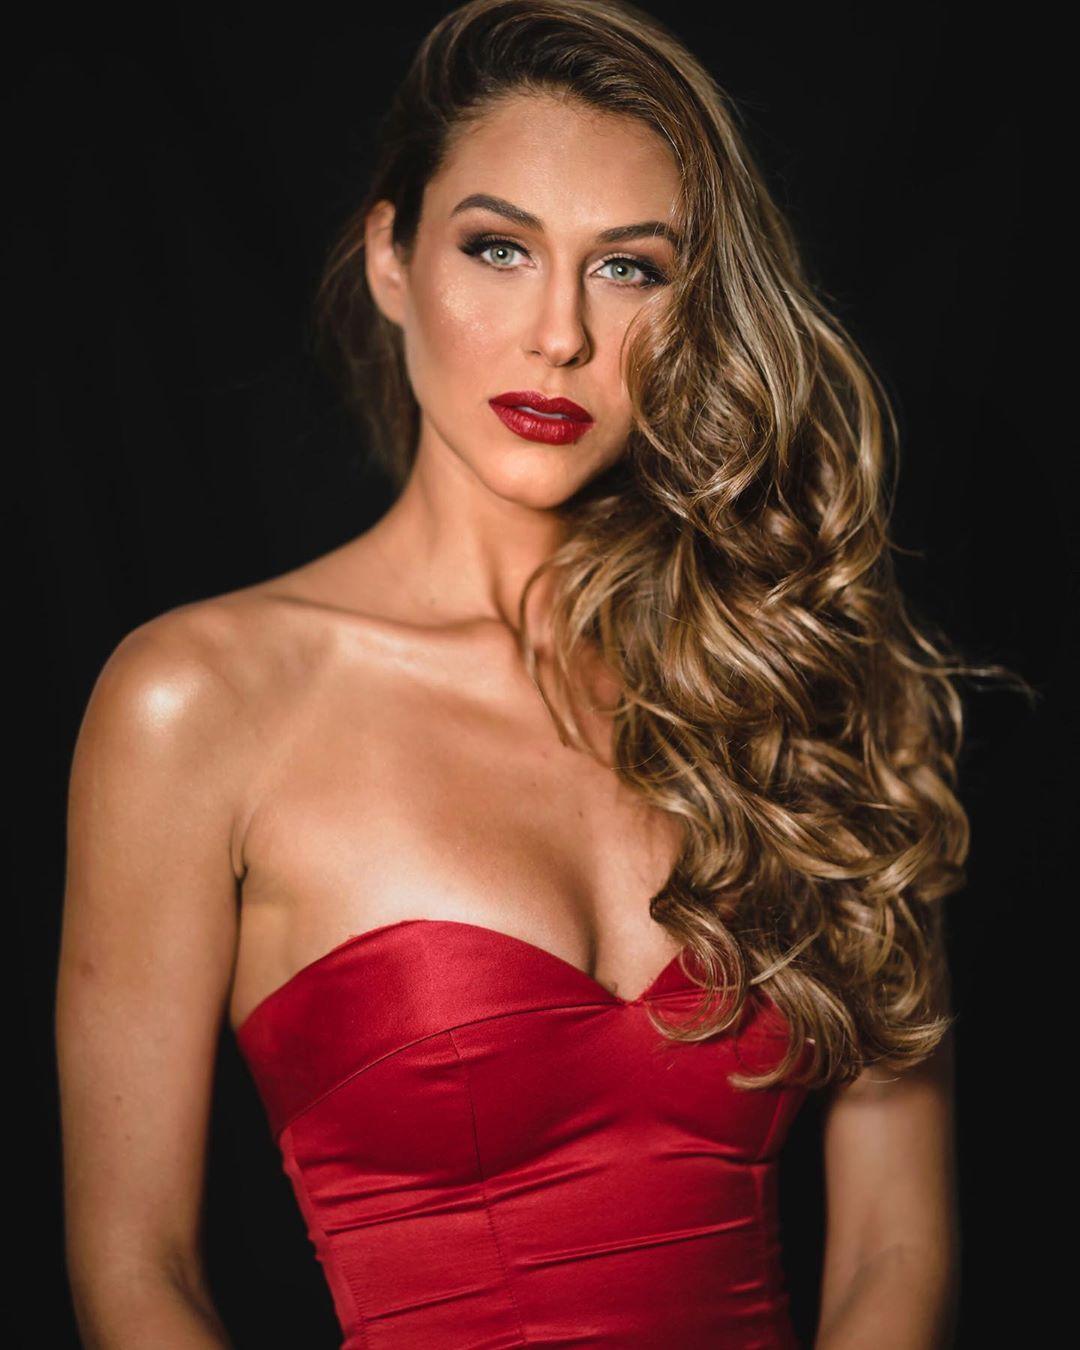 carolina stankevicius, miss brasil internacional 2019. - Página 2 70705510